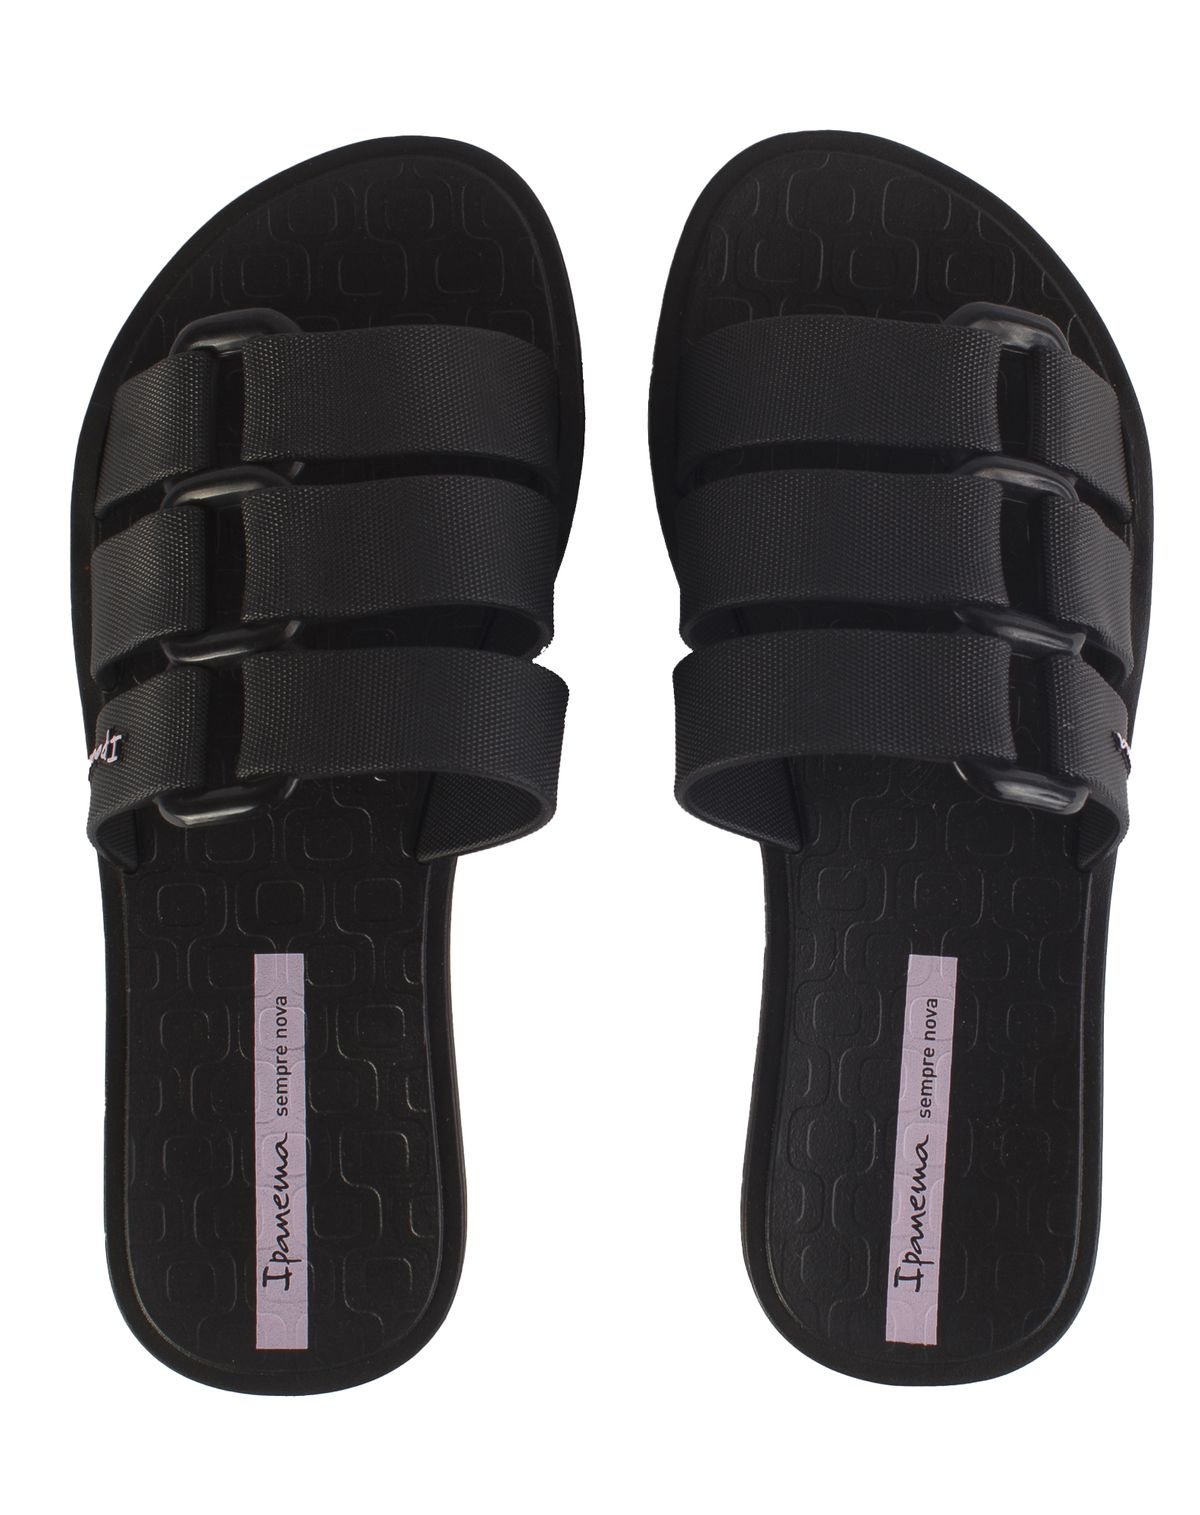 558909001-chinelo-feminino-slide-ipanema-preto-33-4-ce2